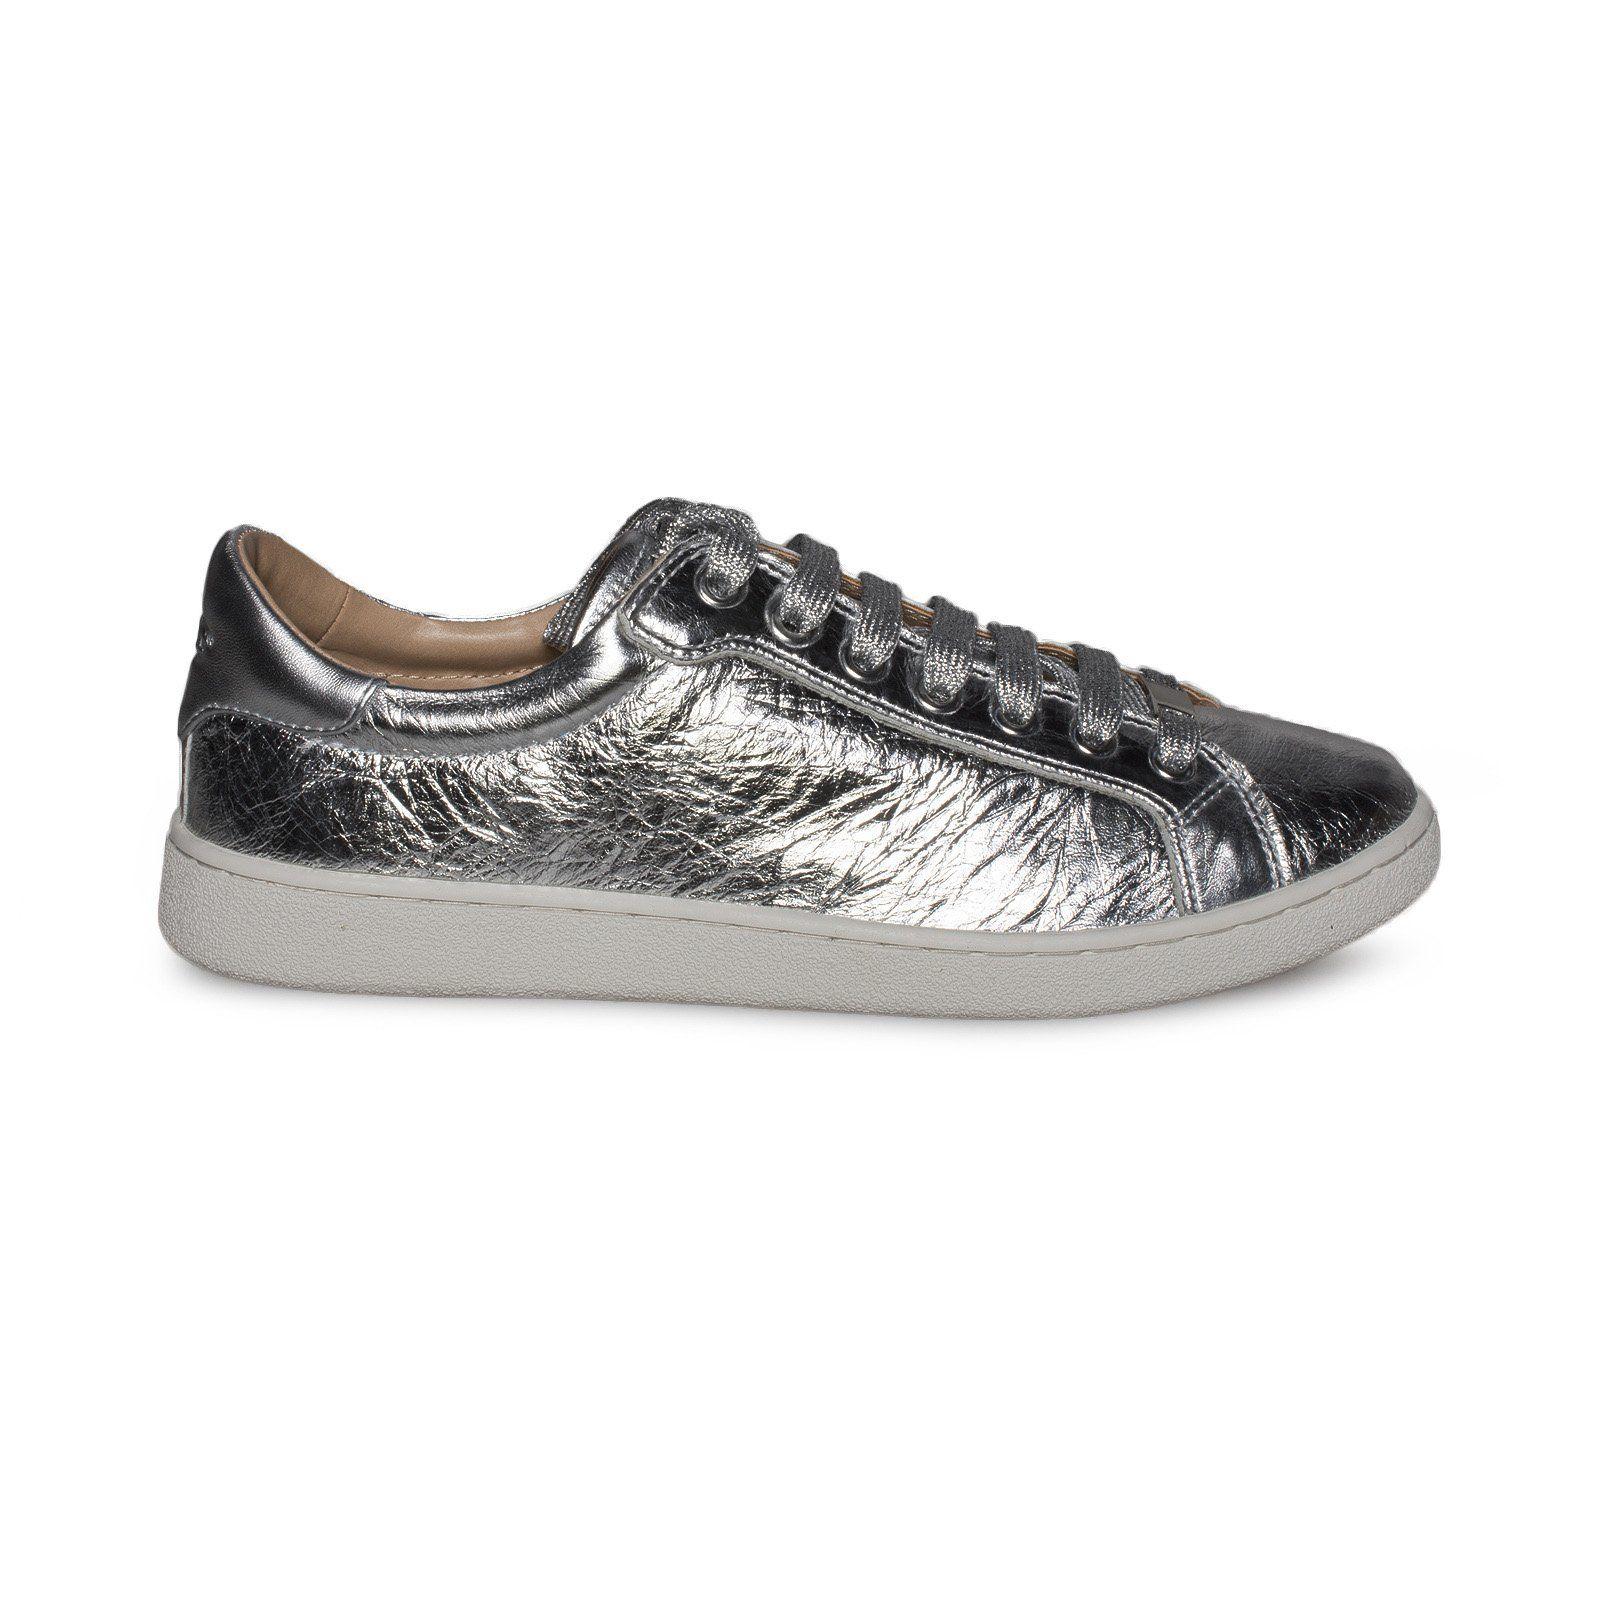 UGG Milo Metallic Silver Sneakers